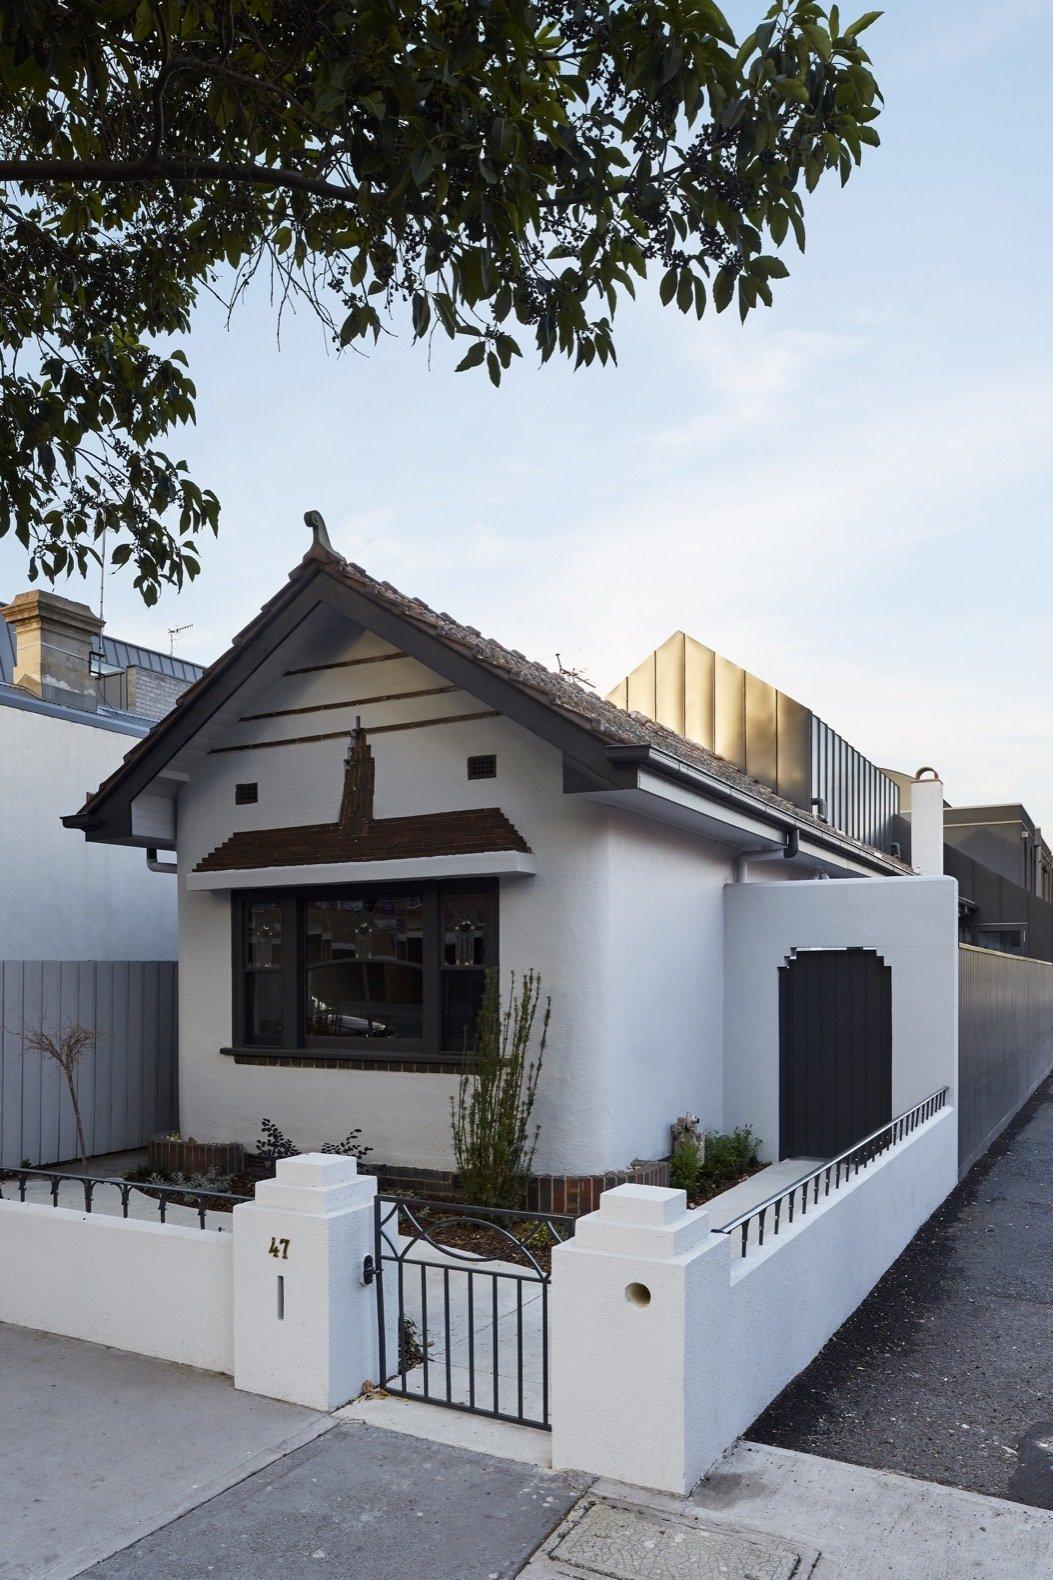 An Art Deco Dwelling Receives a Sleek, Contemporary Extension